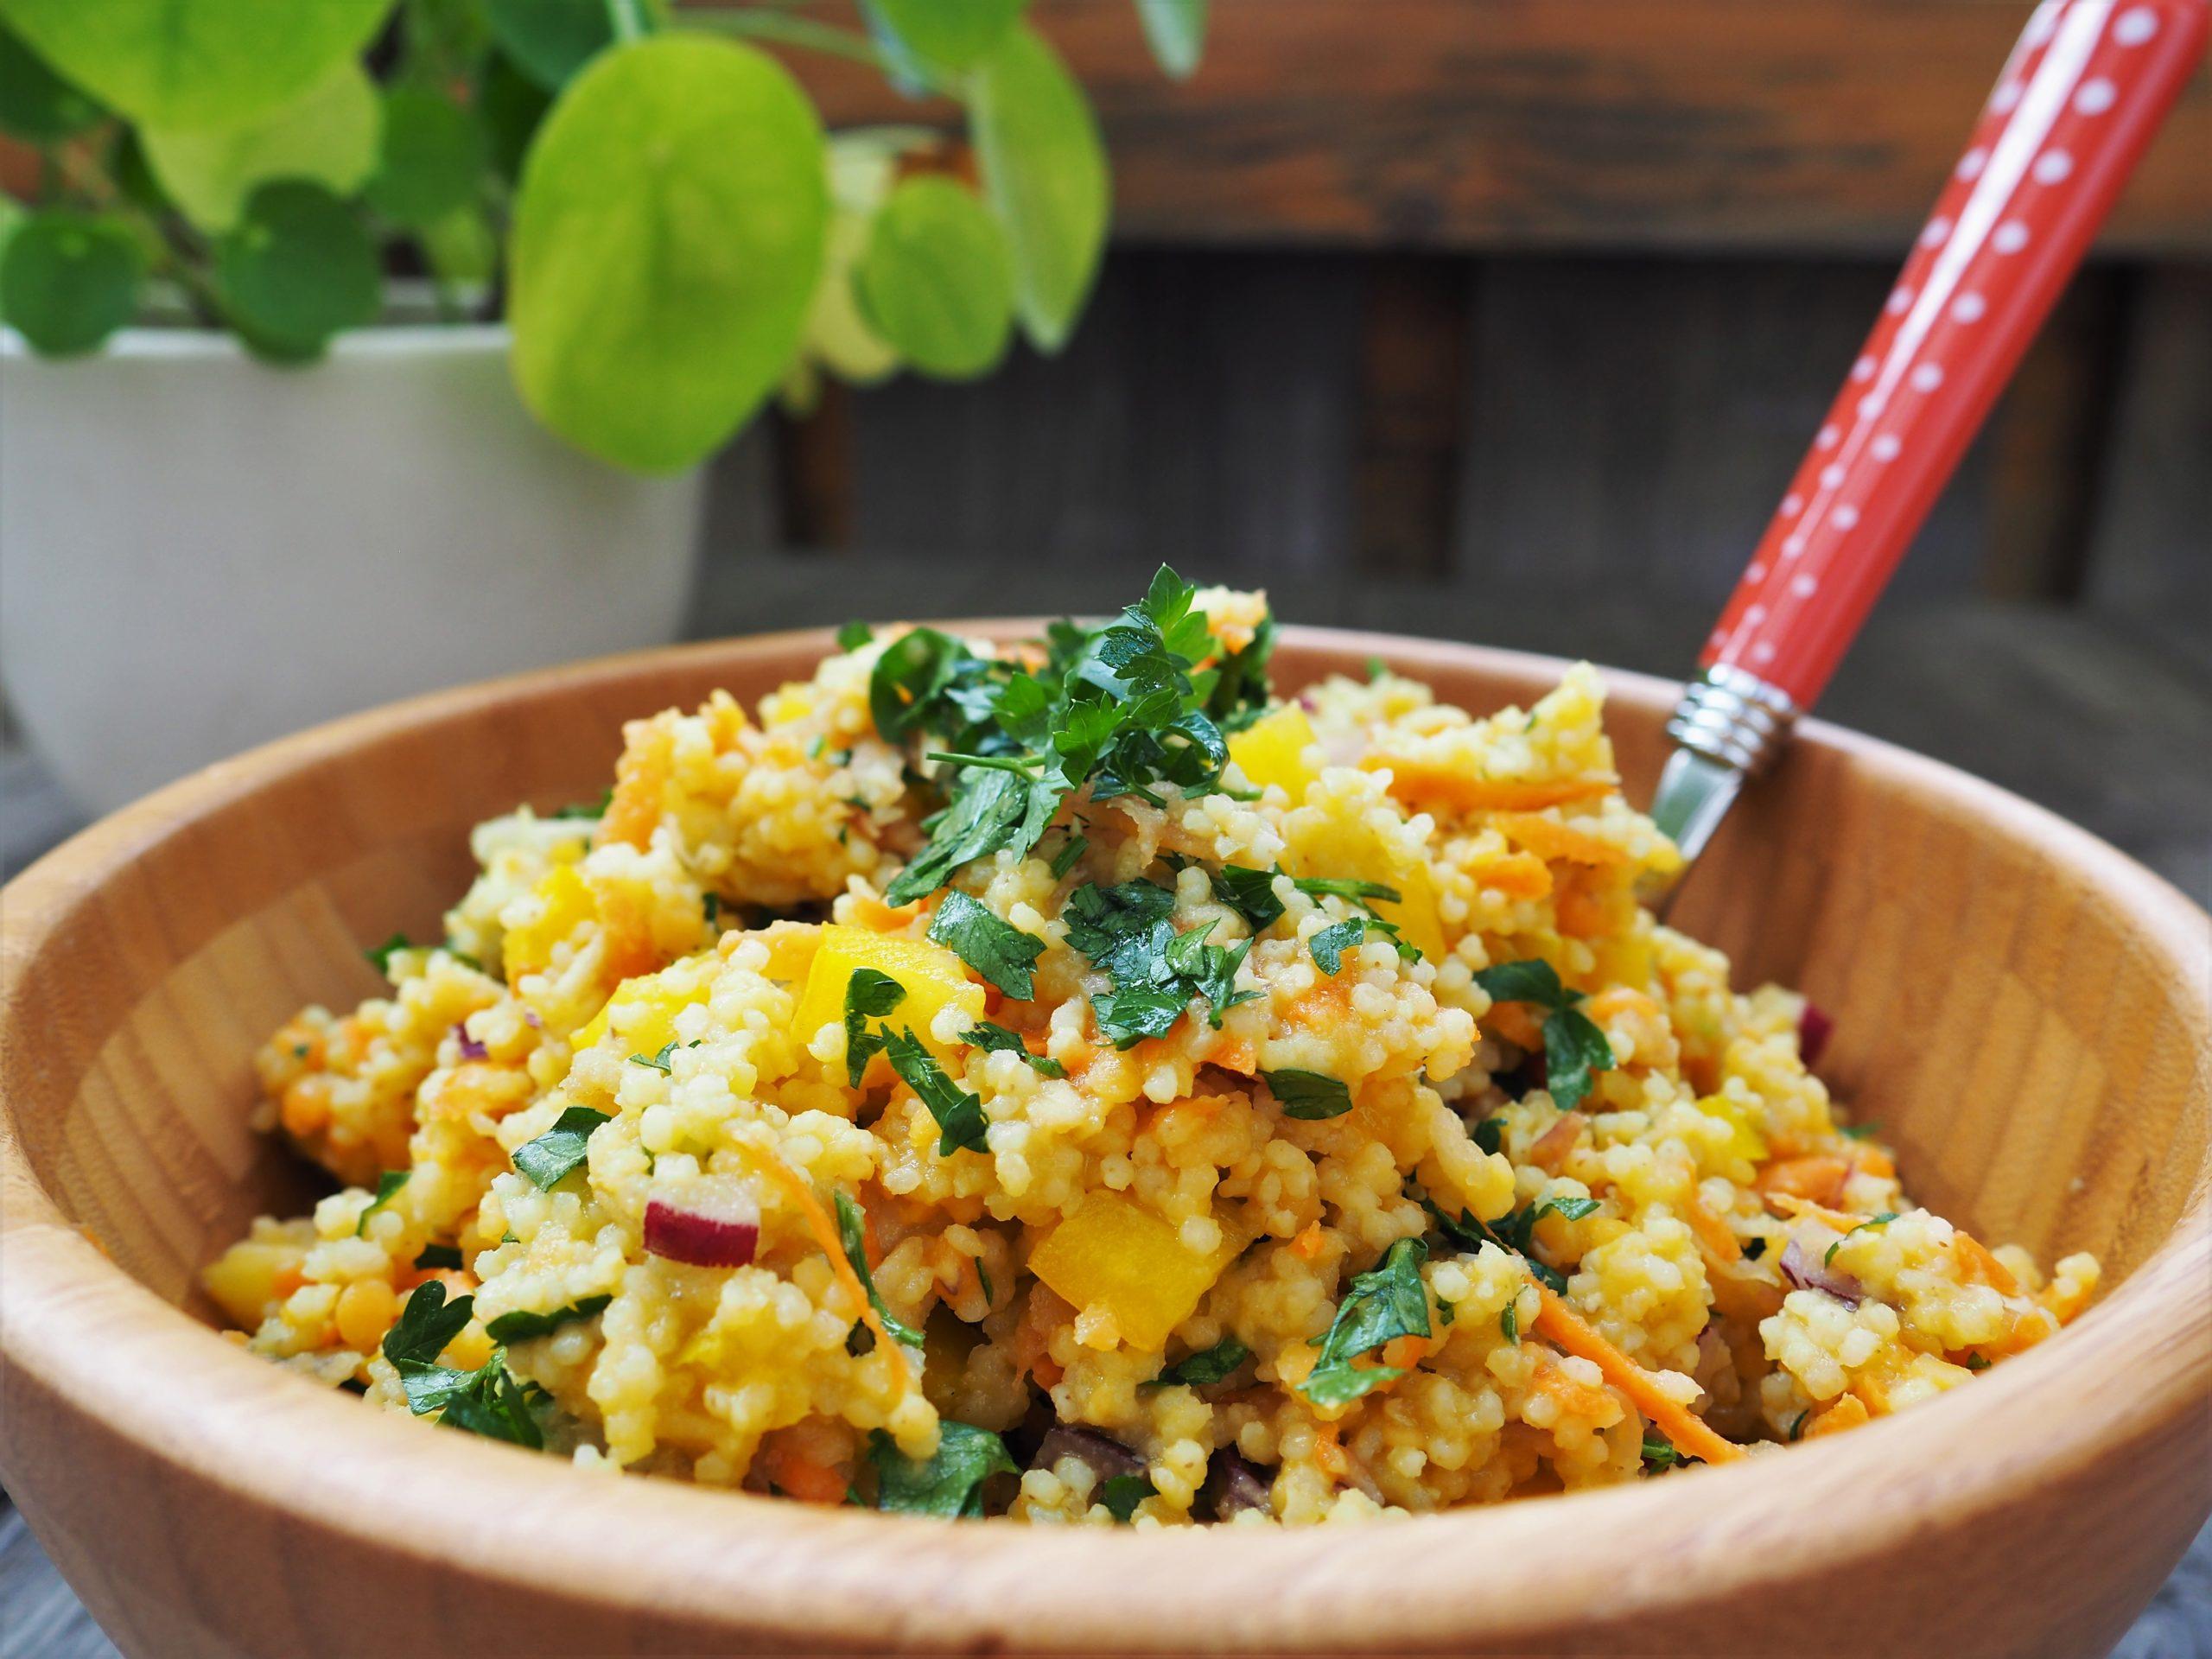 Hirse-Linsen-Salat mit Apfeldressing